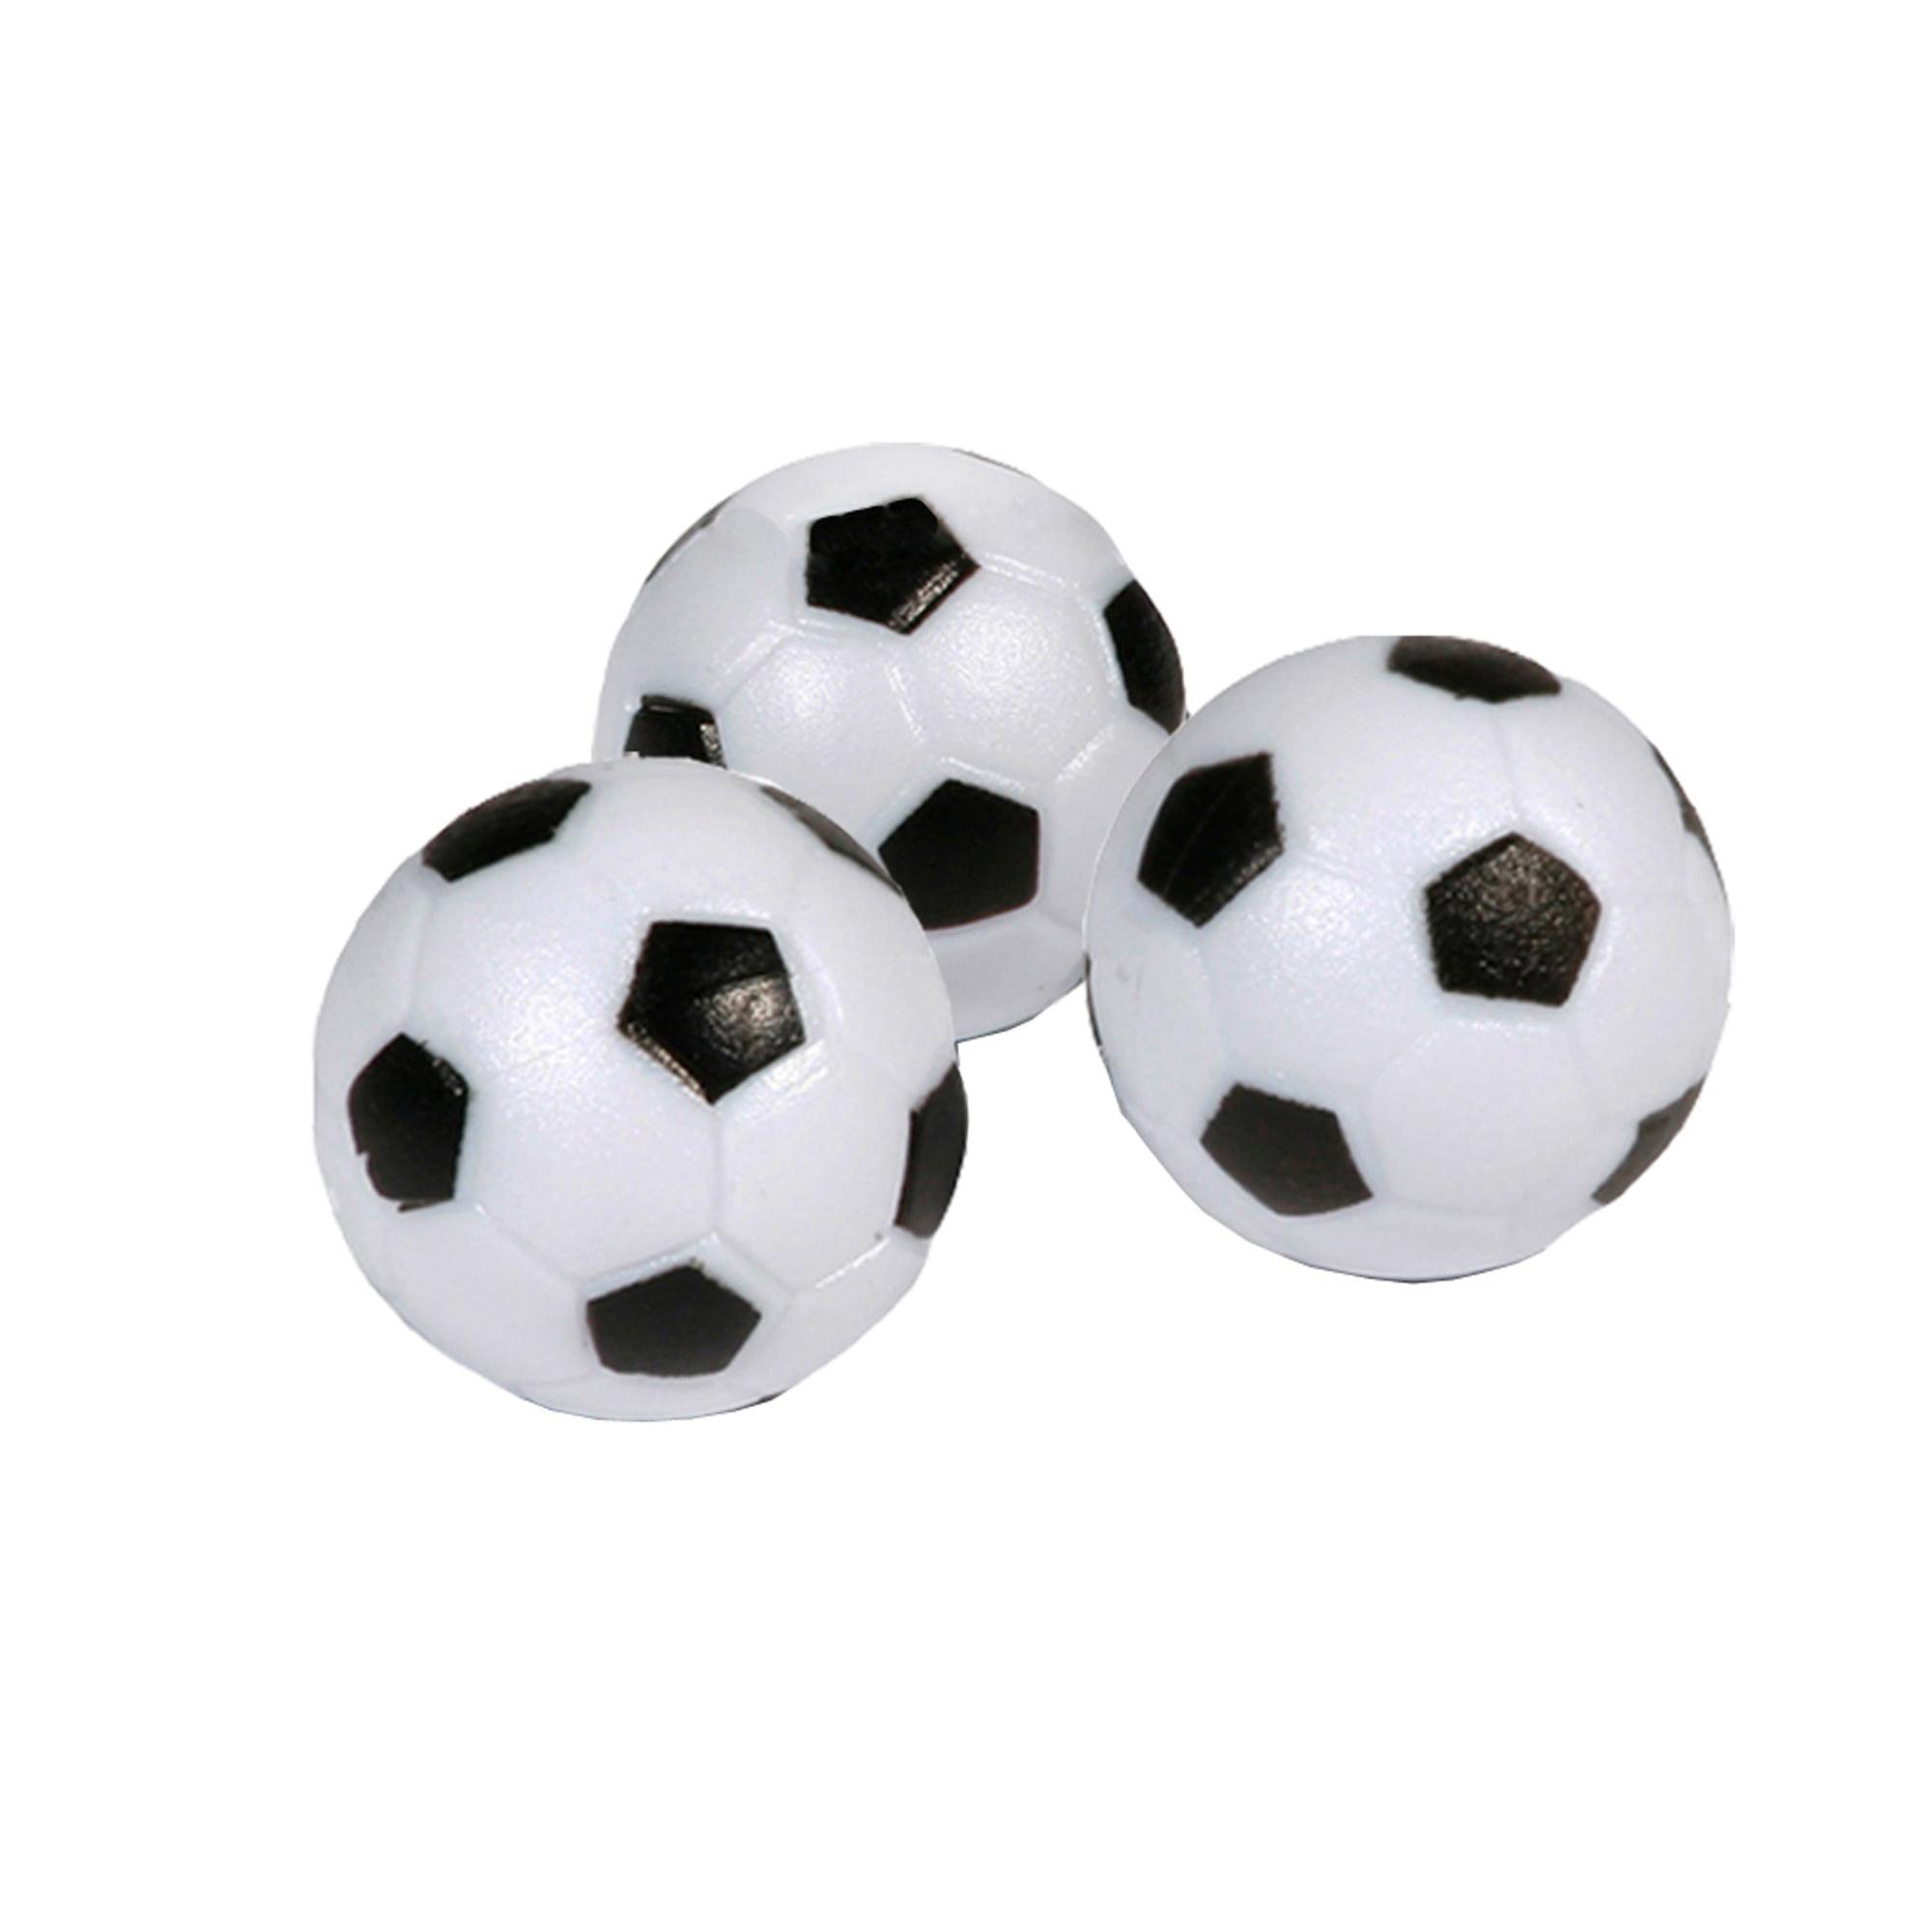 Hathaway Soccer Ball Style Foosballs - 3-pack